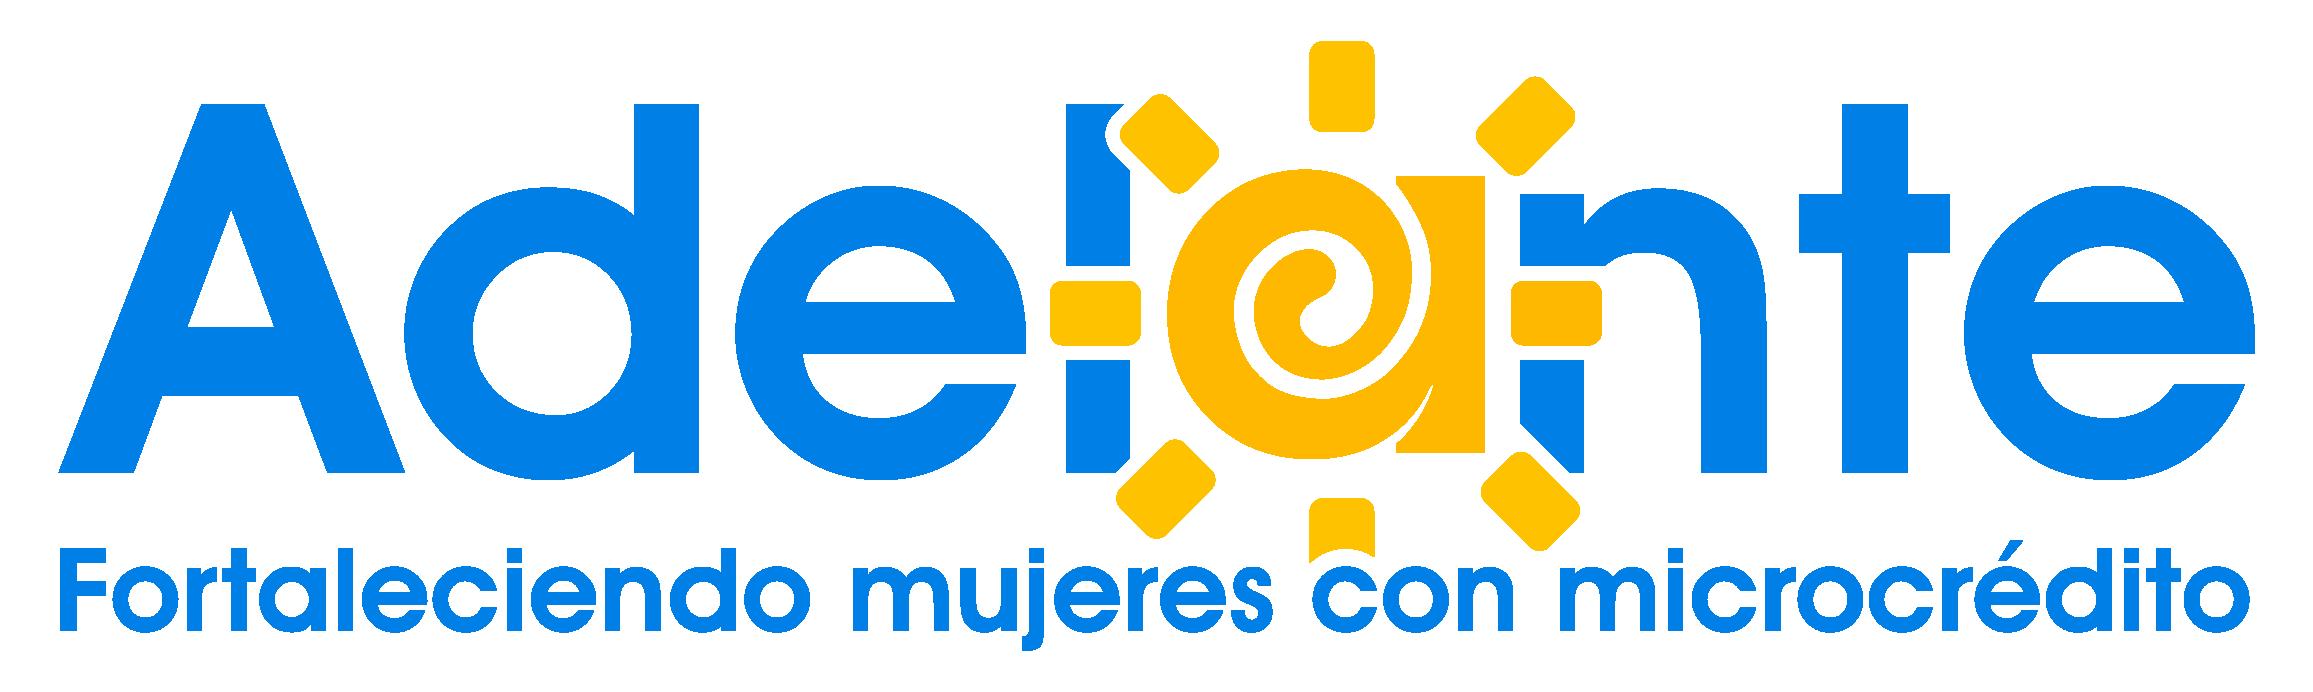 https://honduras.waterforpeople.org/wp-content/uploads/sites/5/2021/02/Adelante-Logo-2021-01.png